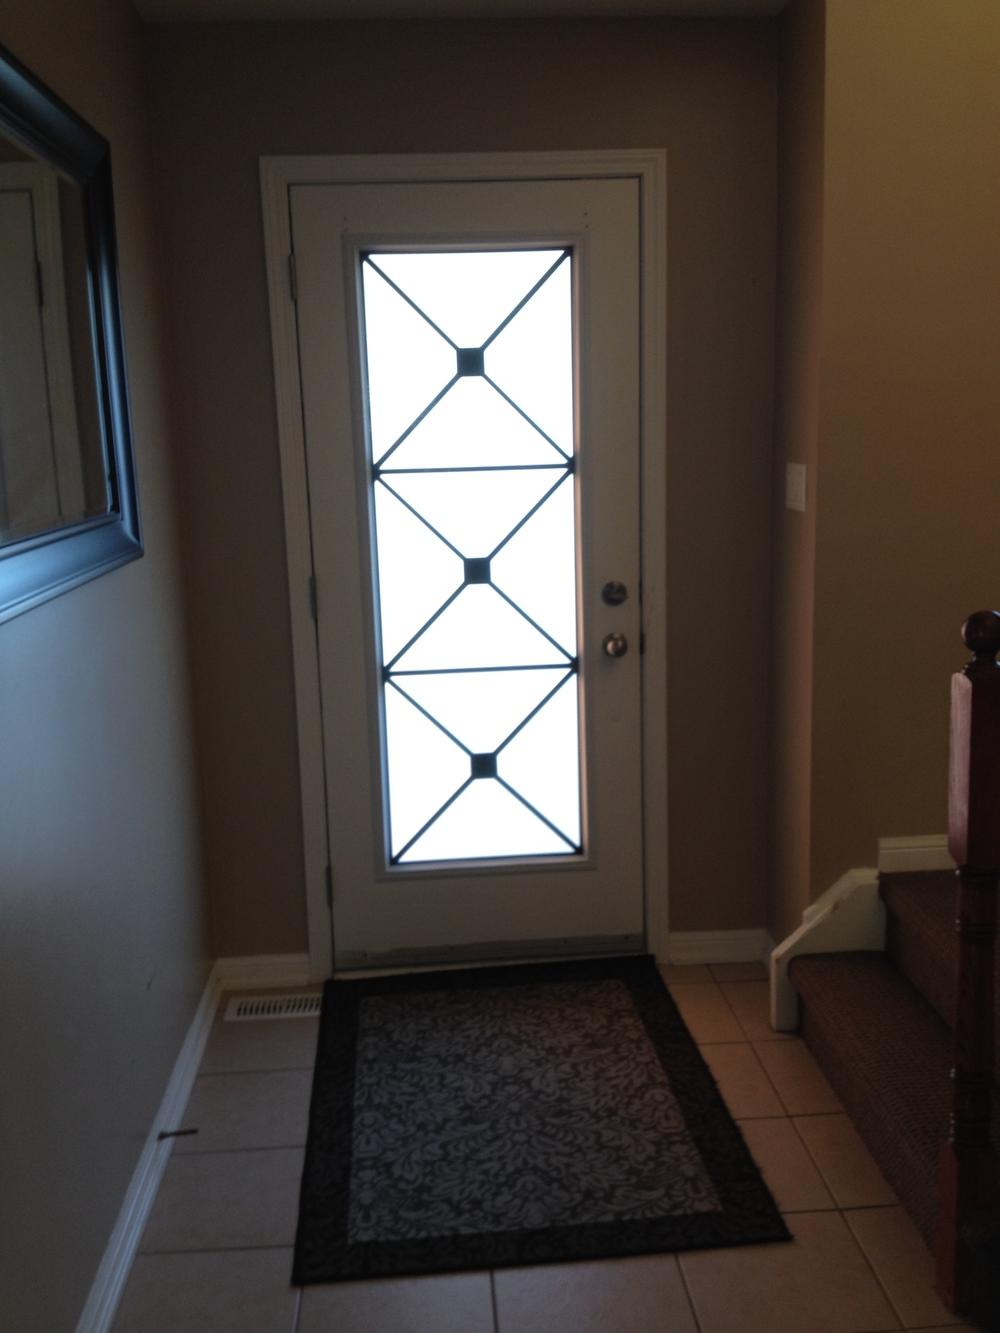 x-design-wrought-iron-glass-door-inserts-Richmond-Hill-Ontario